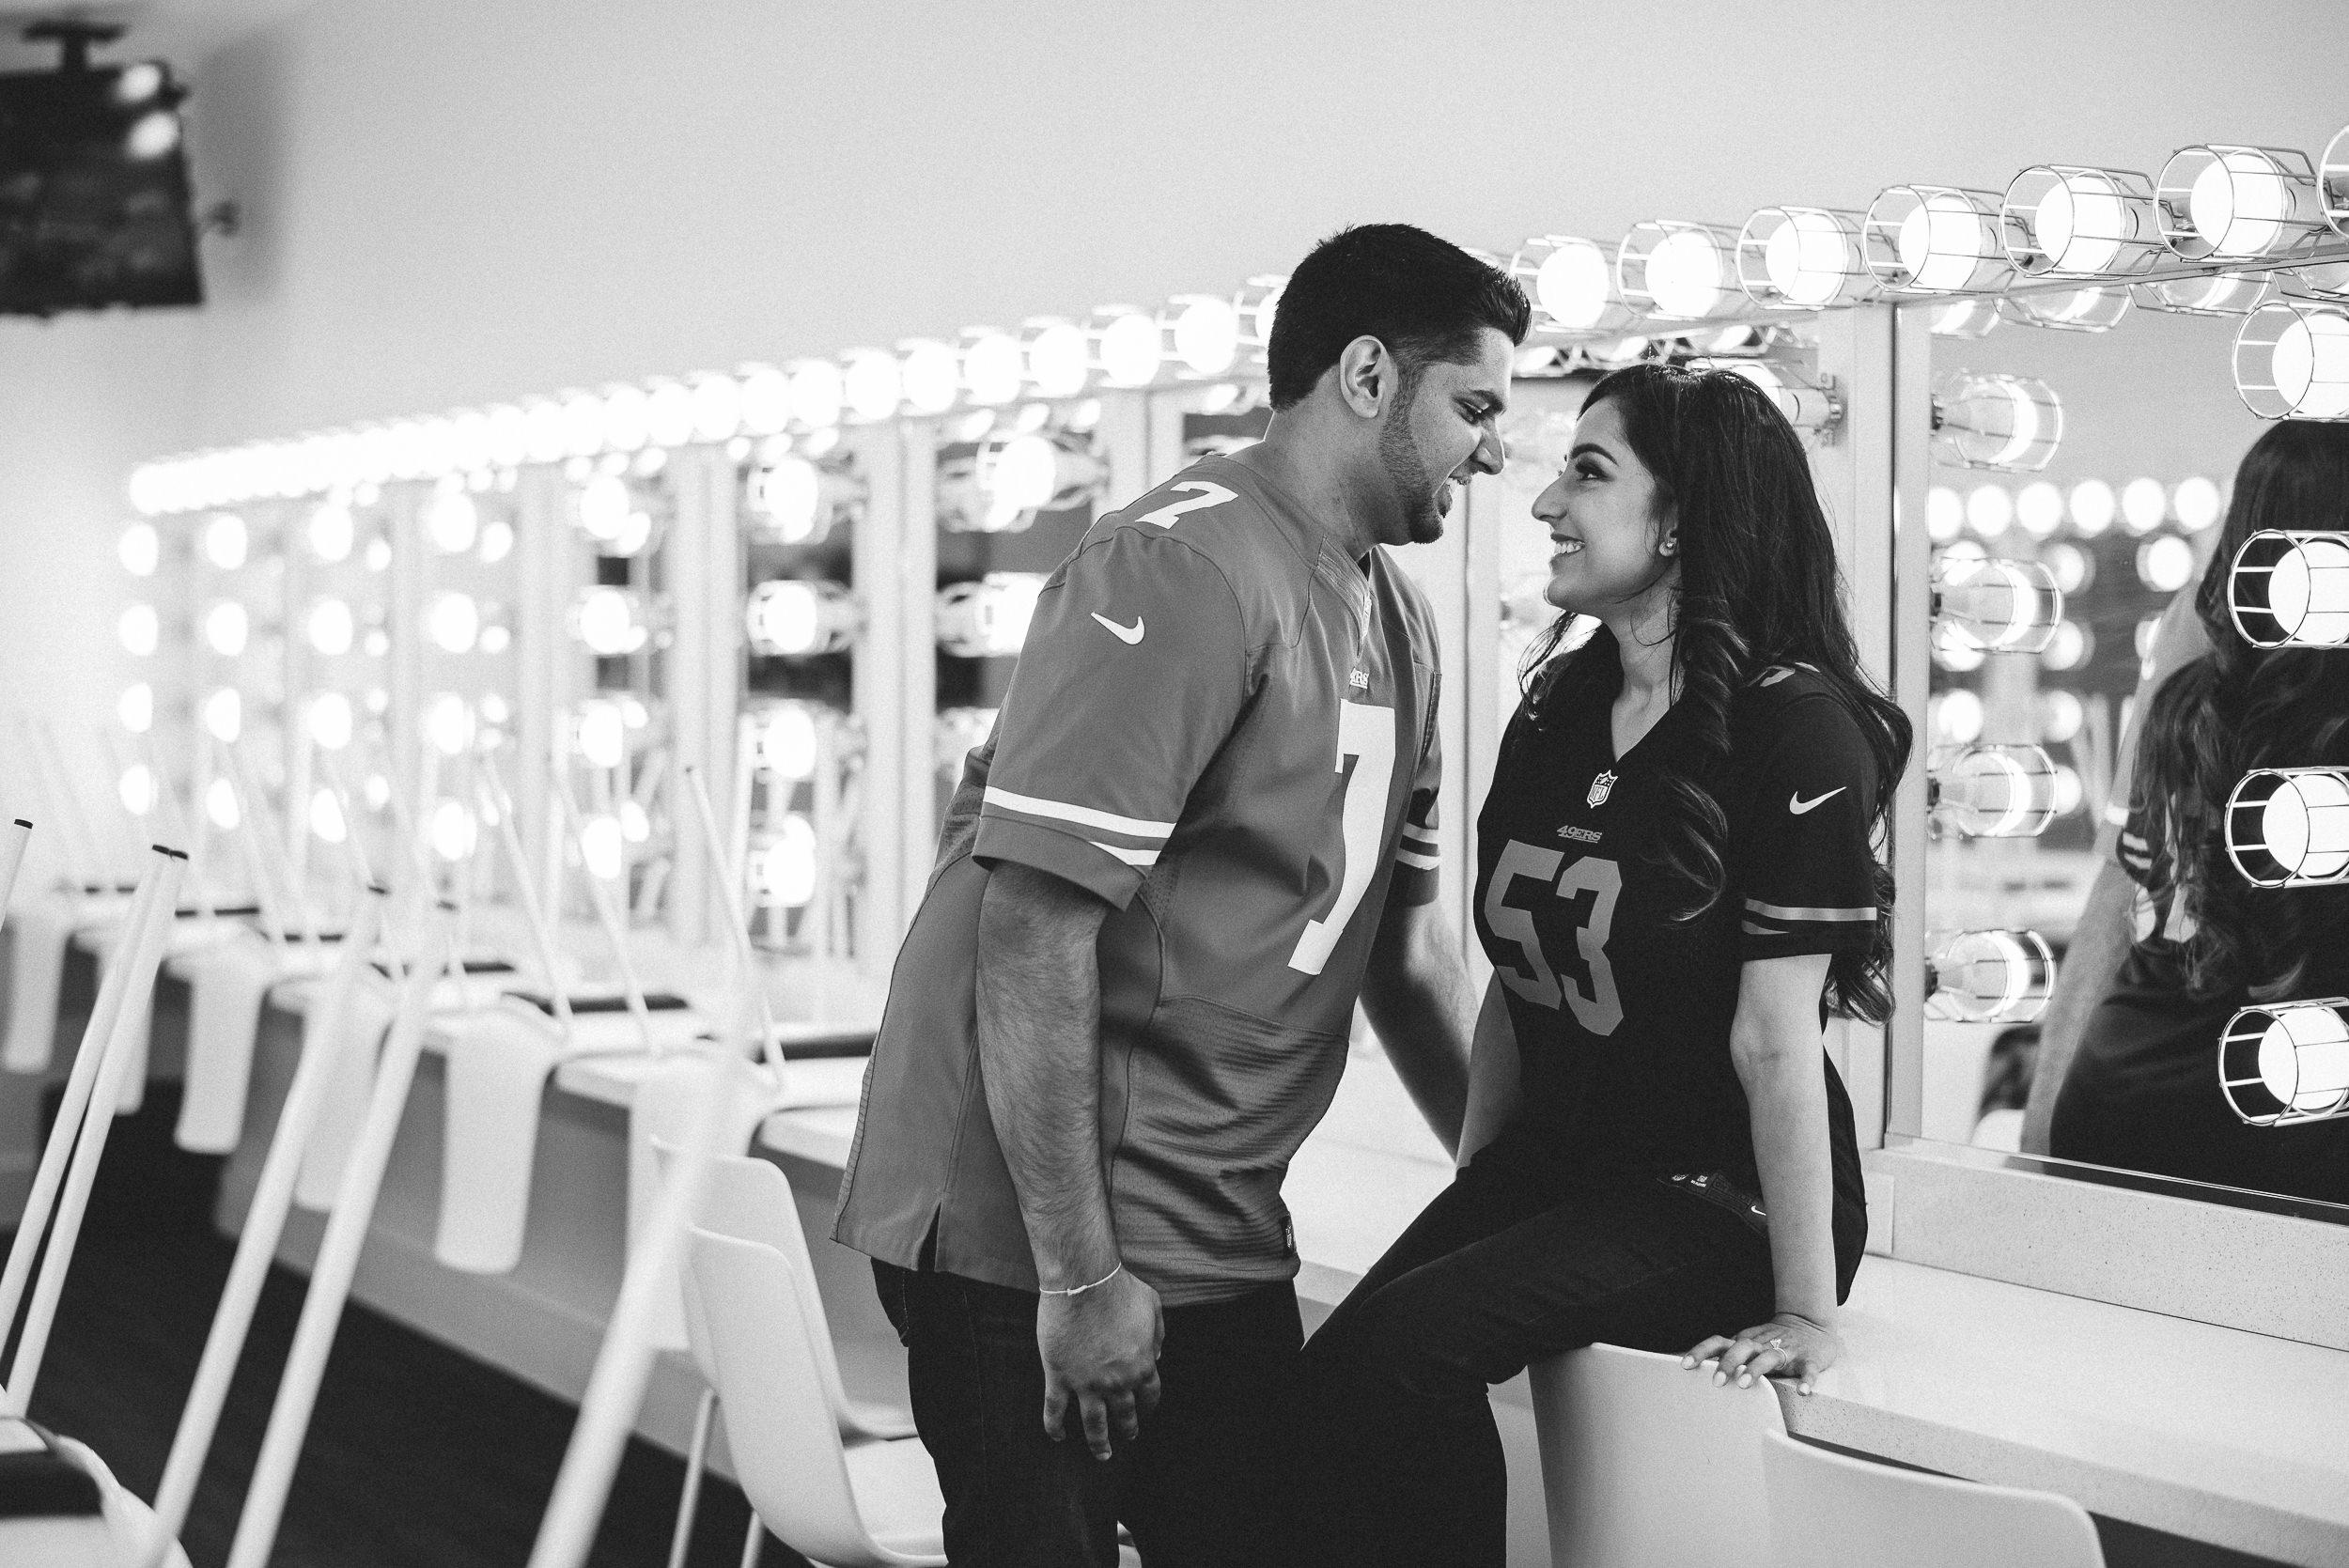 San-Francisco-49ers-Levis-Stadium-Engagement-Photography-020.jpg